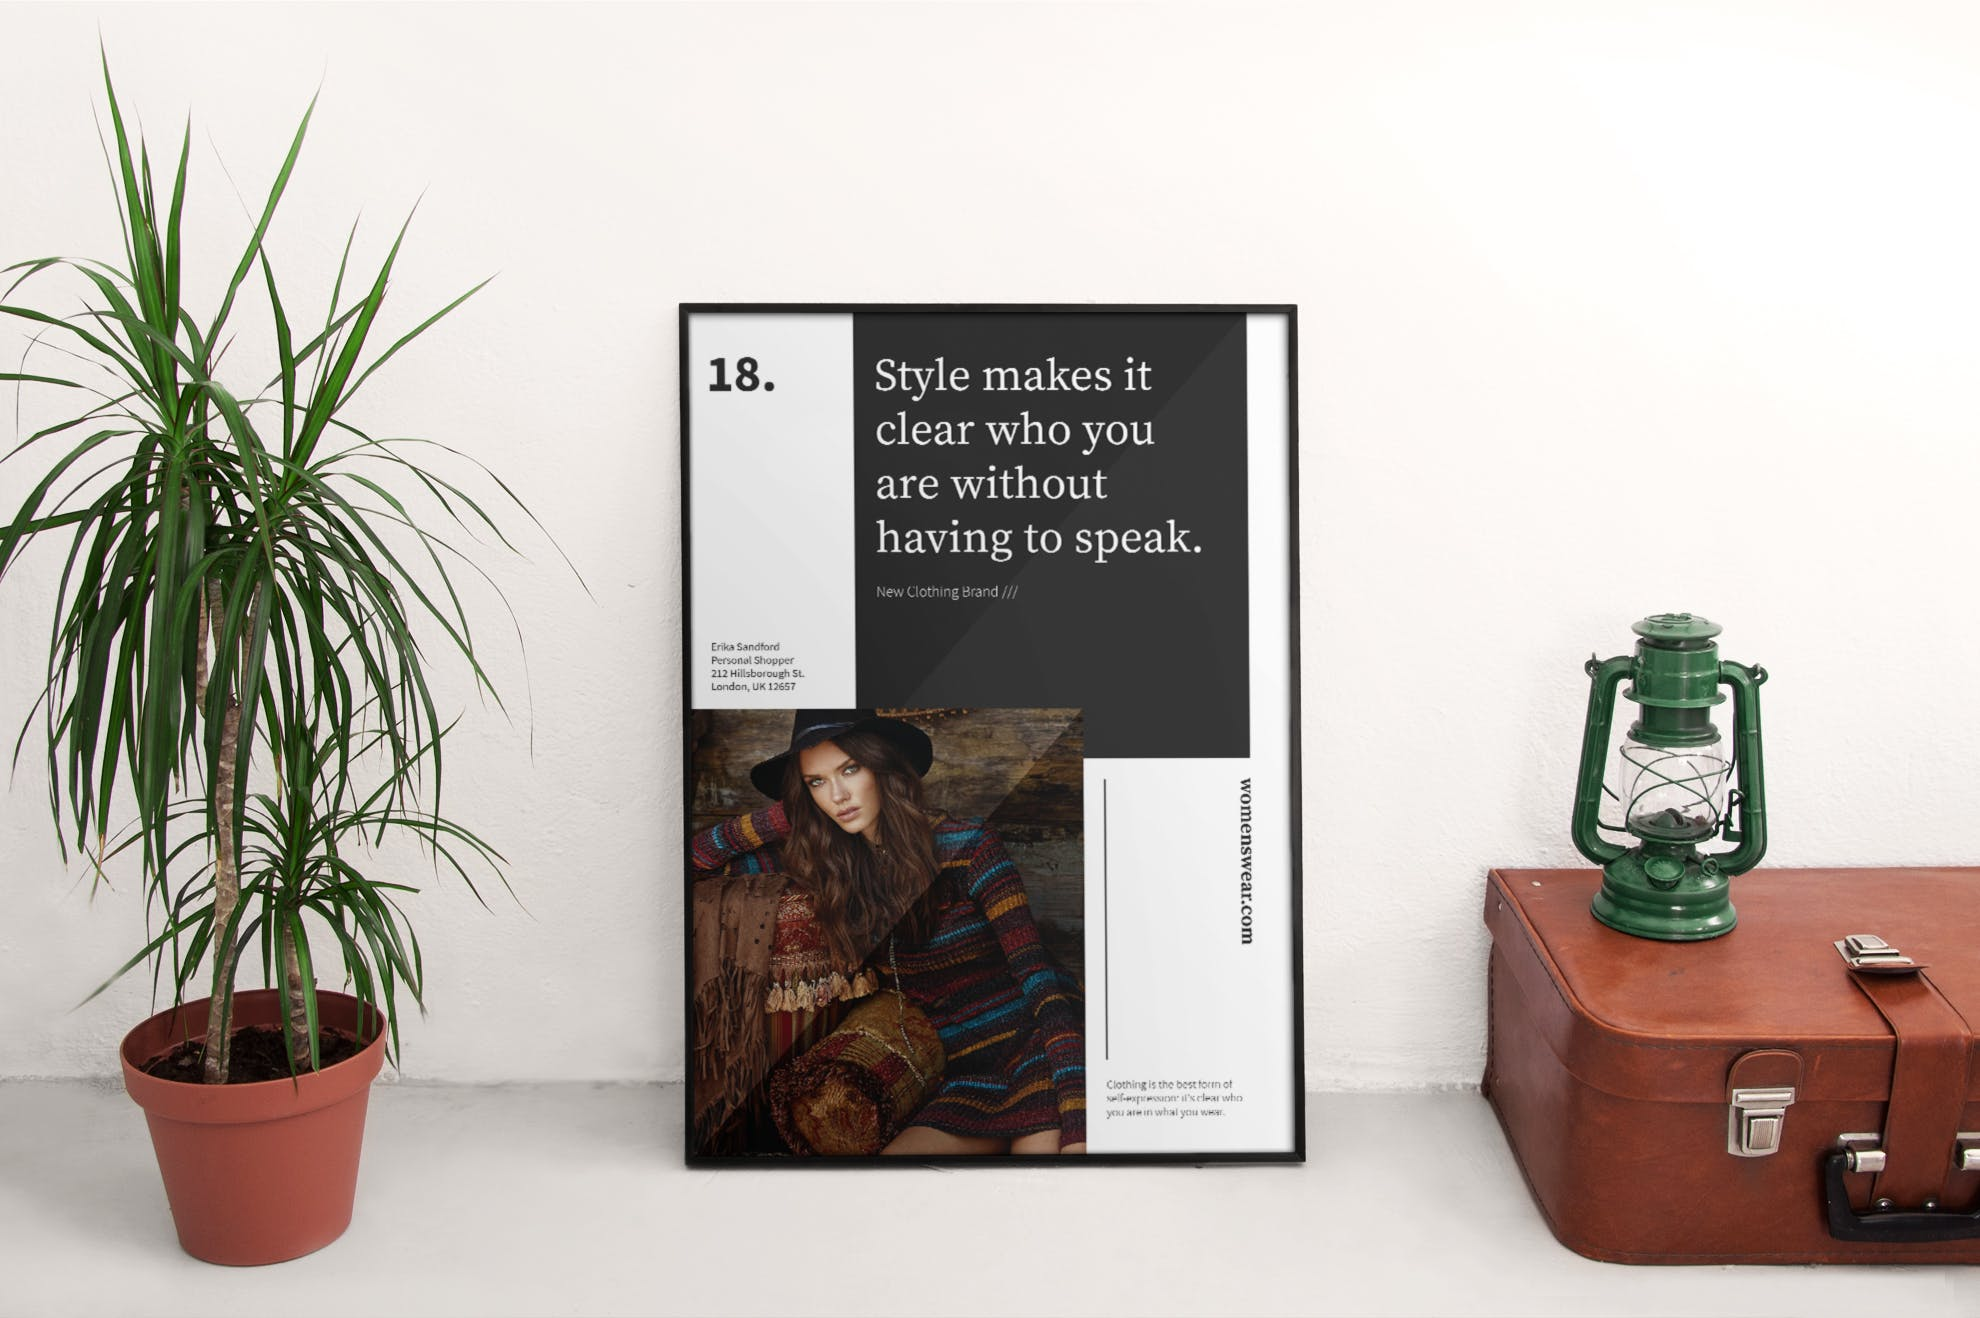 高端品牌服装传单和海报模板Shopper Services Flyer and Poster Template Ba2n7p